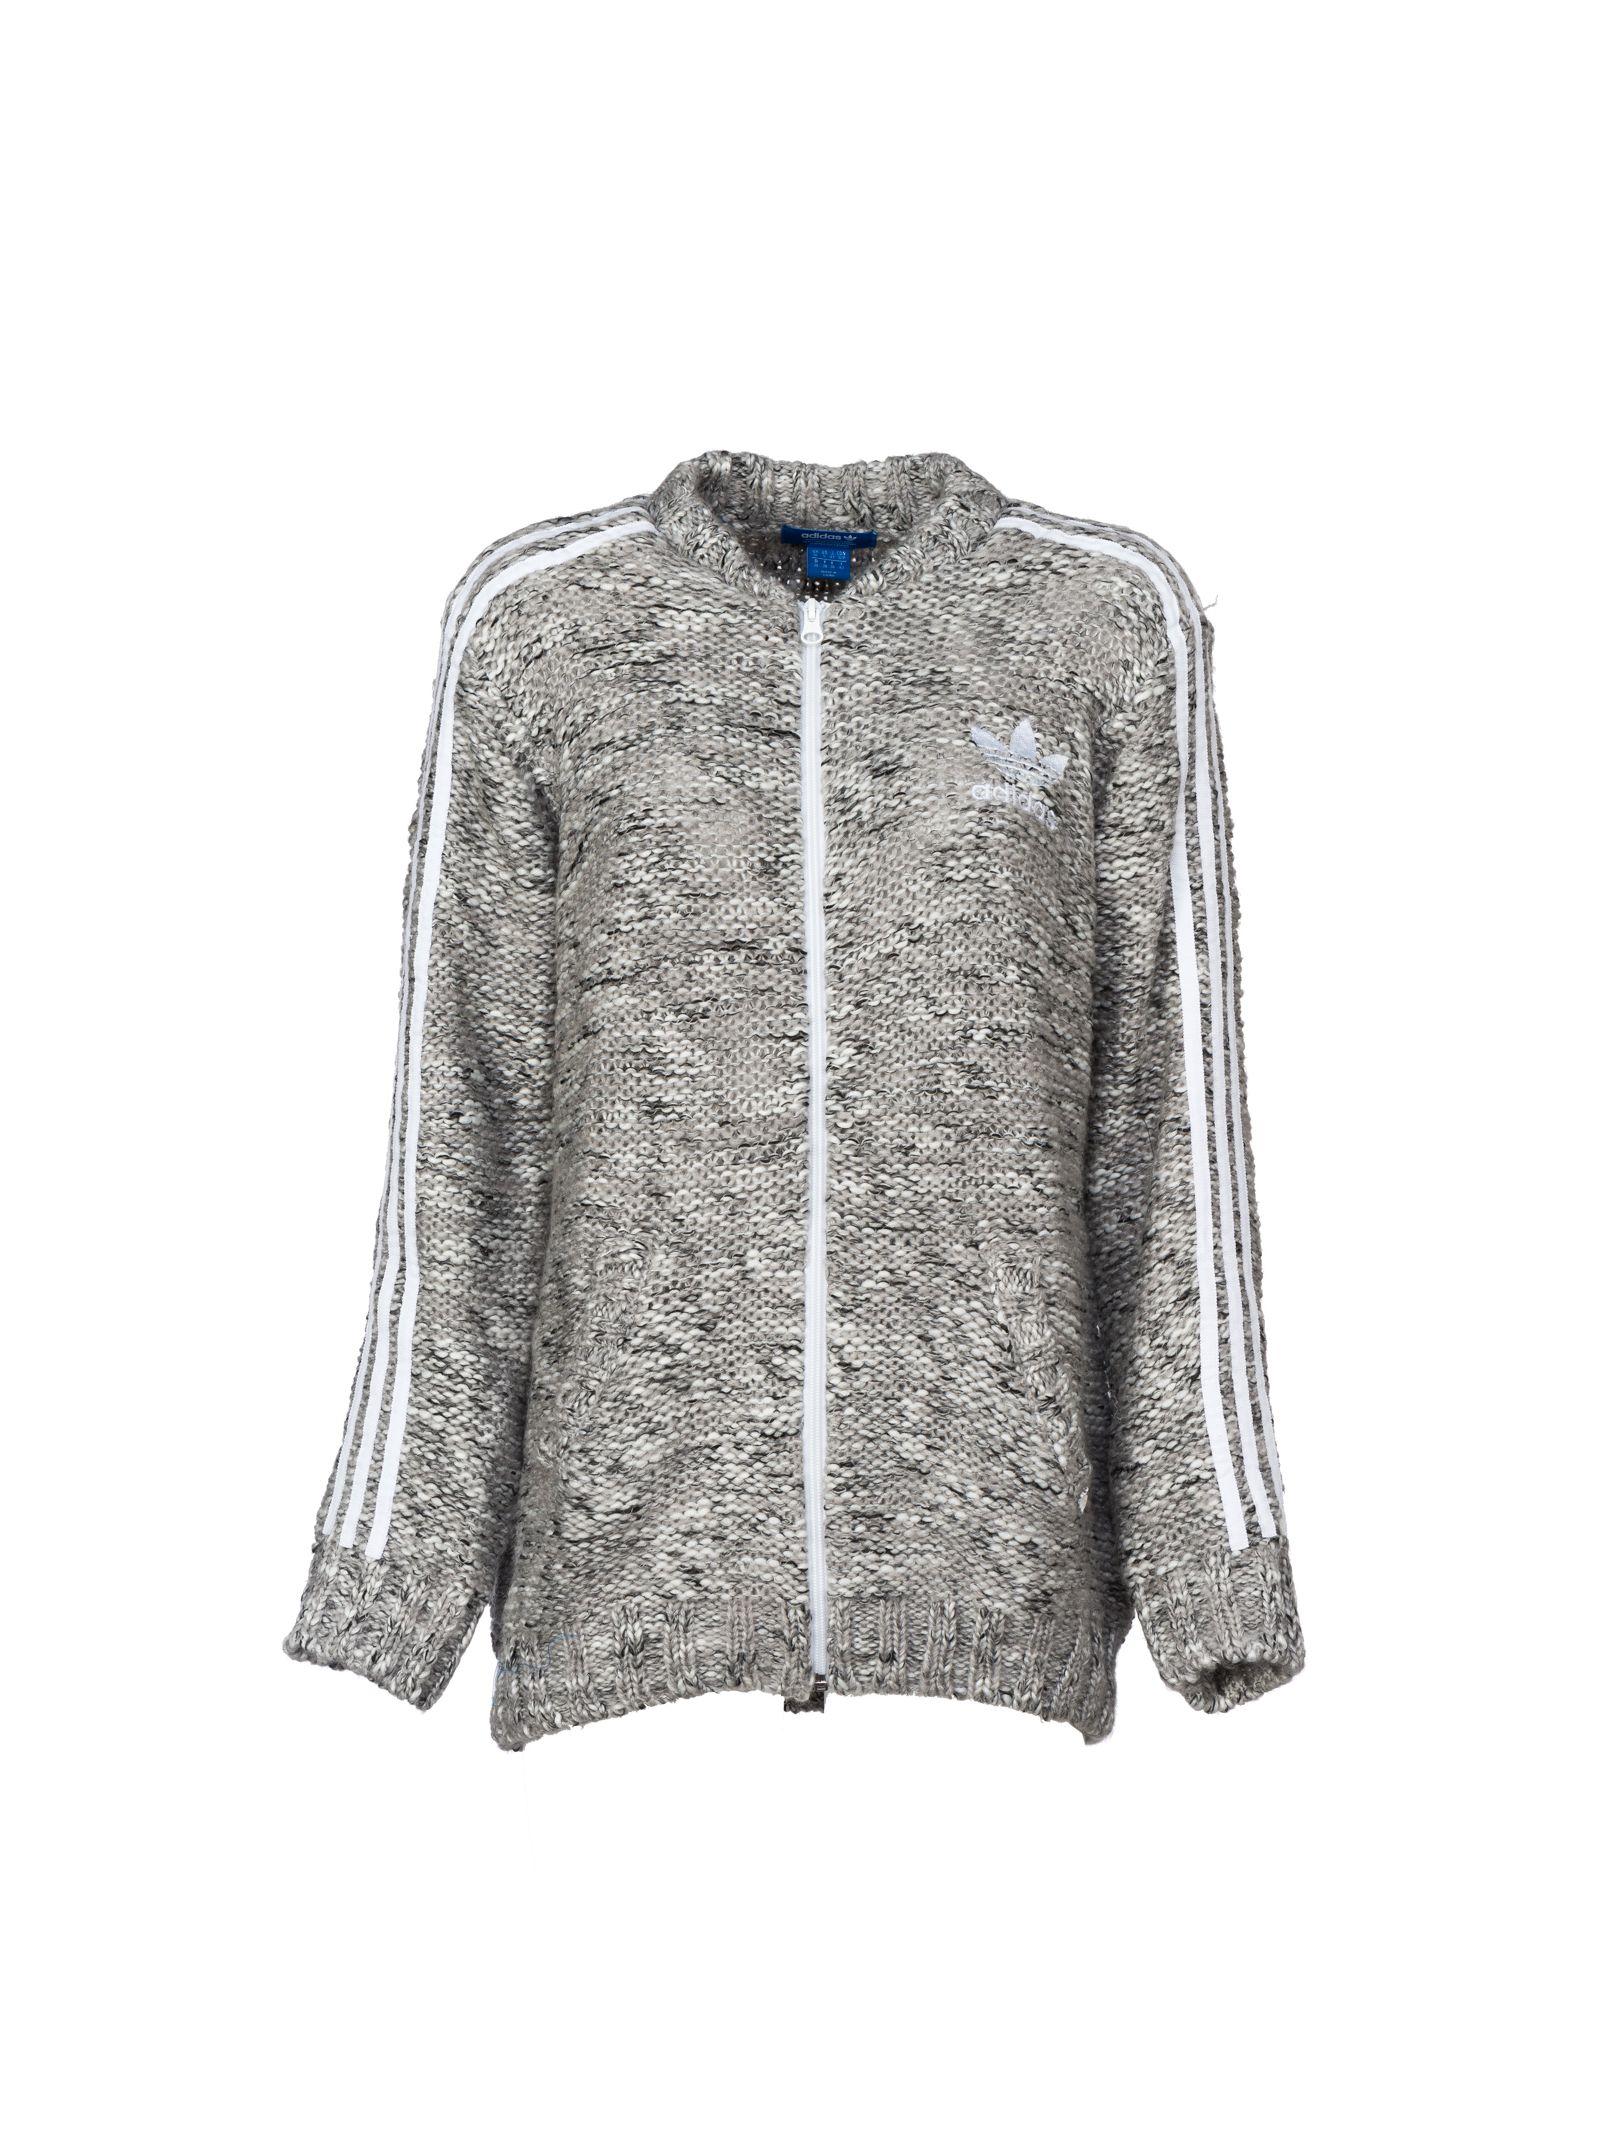 Adidas Originals Tracktop Sweater